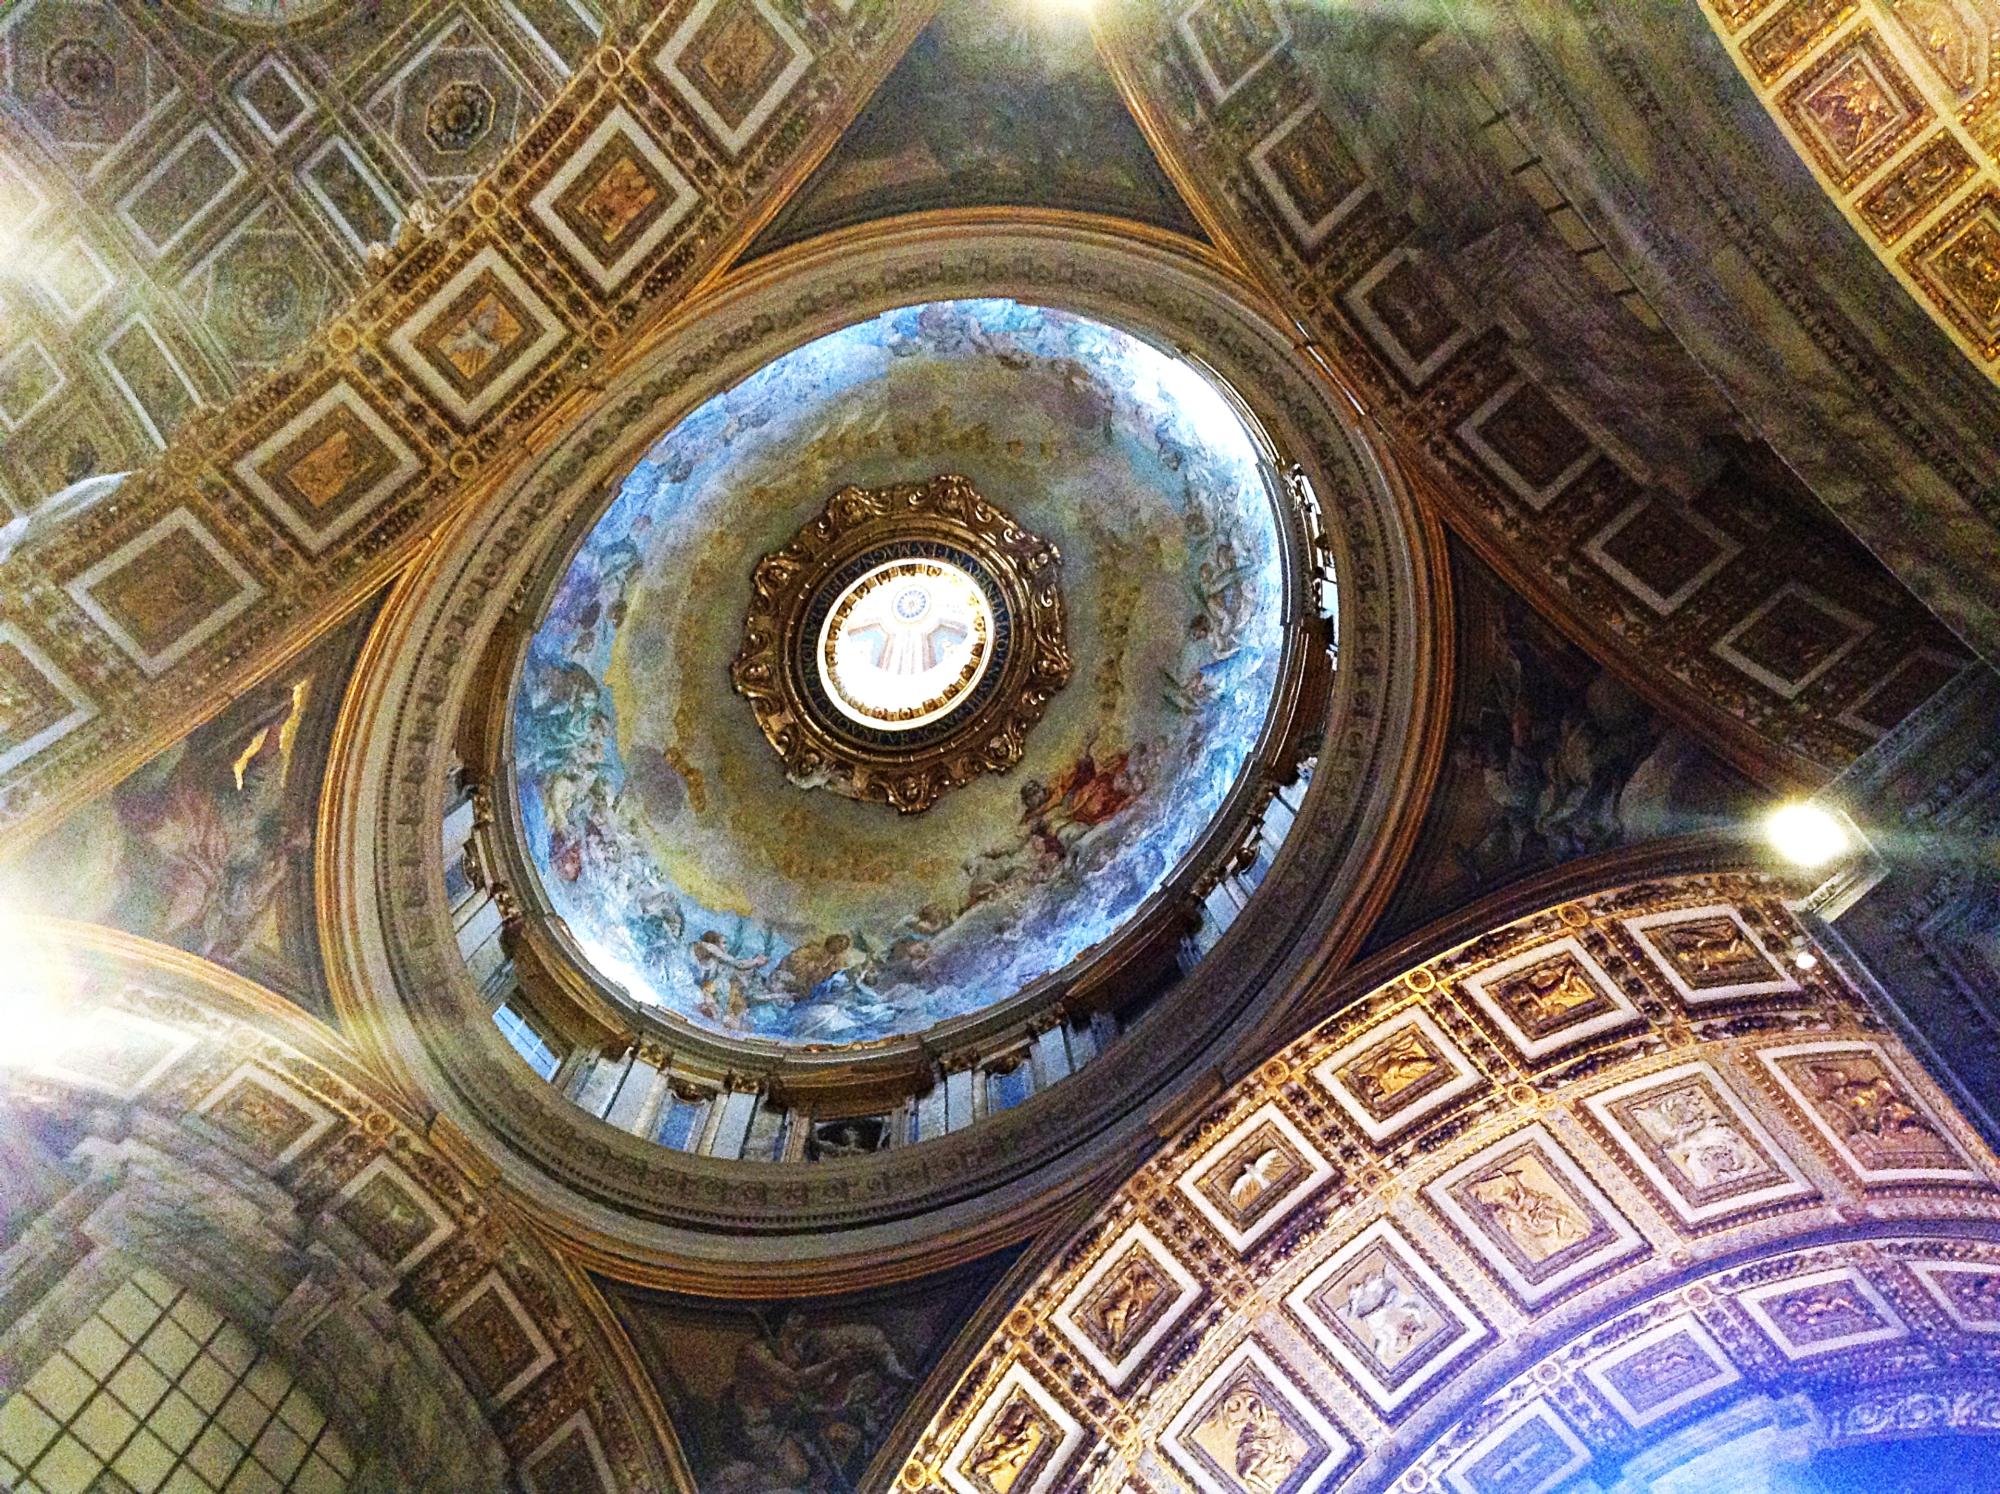 St. Peter's Basillca